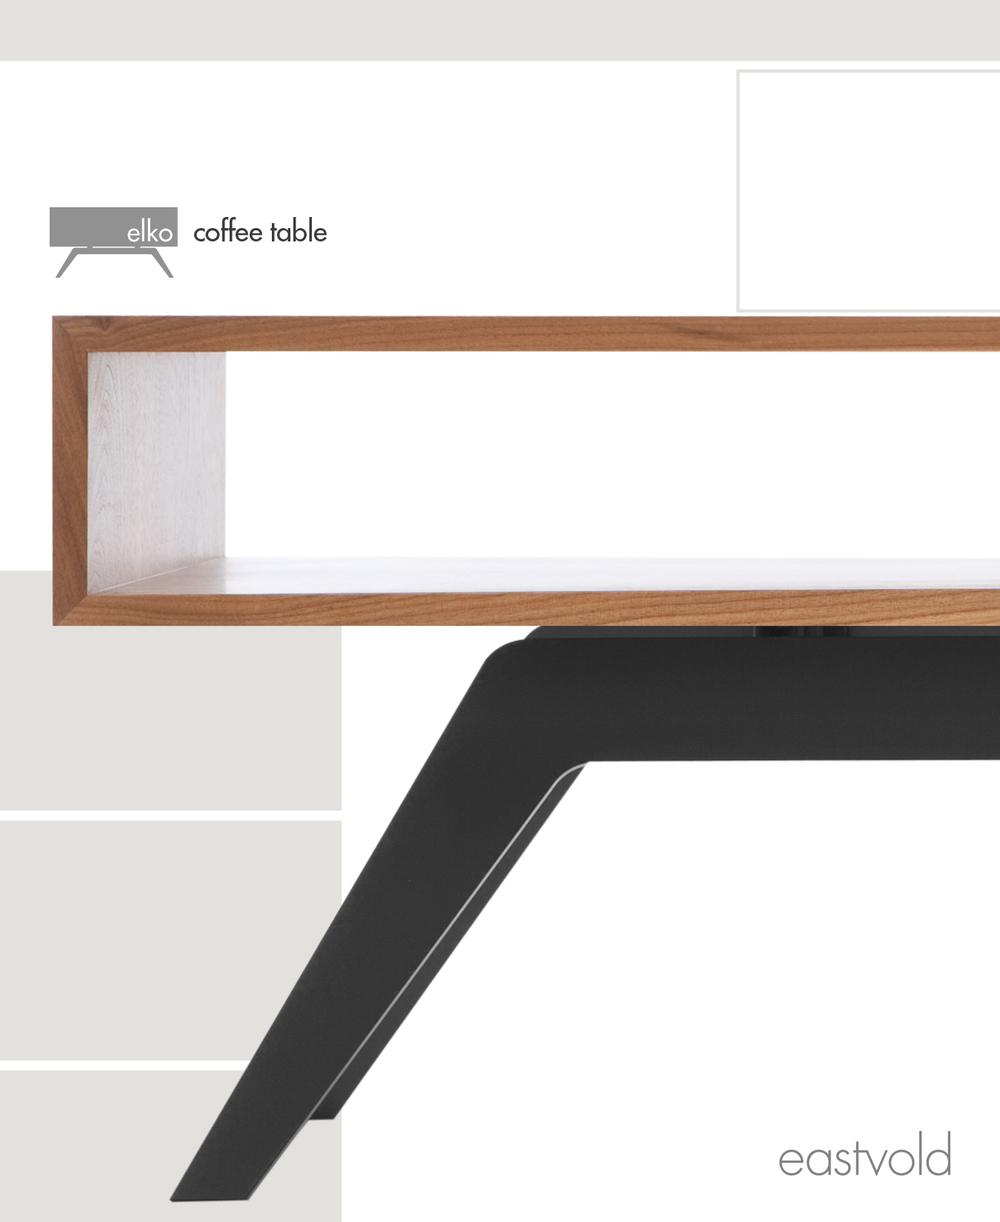 ELKO_COFFEE_TABLE_SELL_SHEET copy.jpg